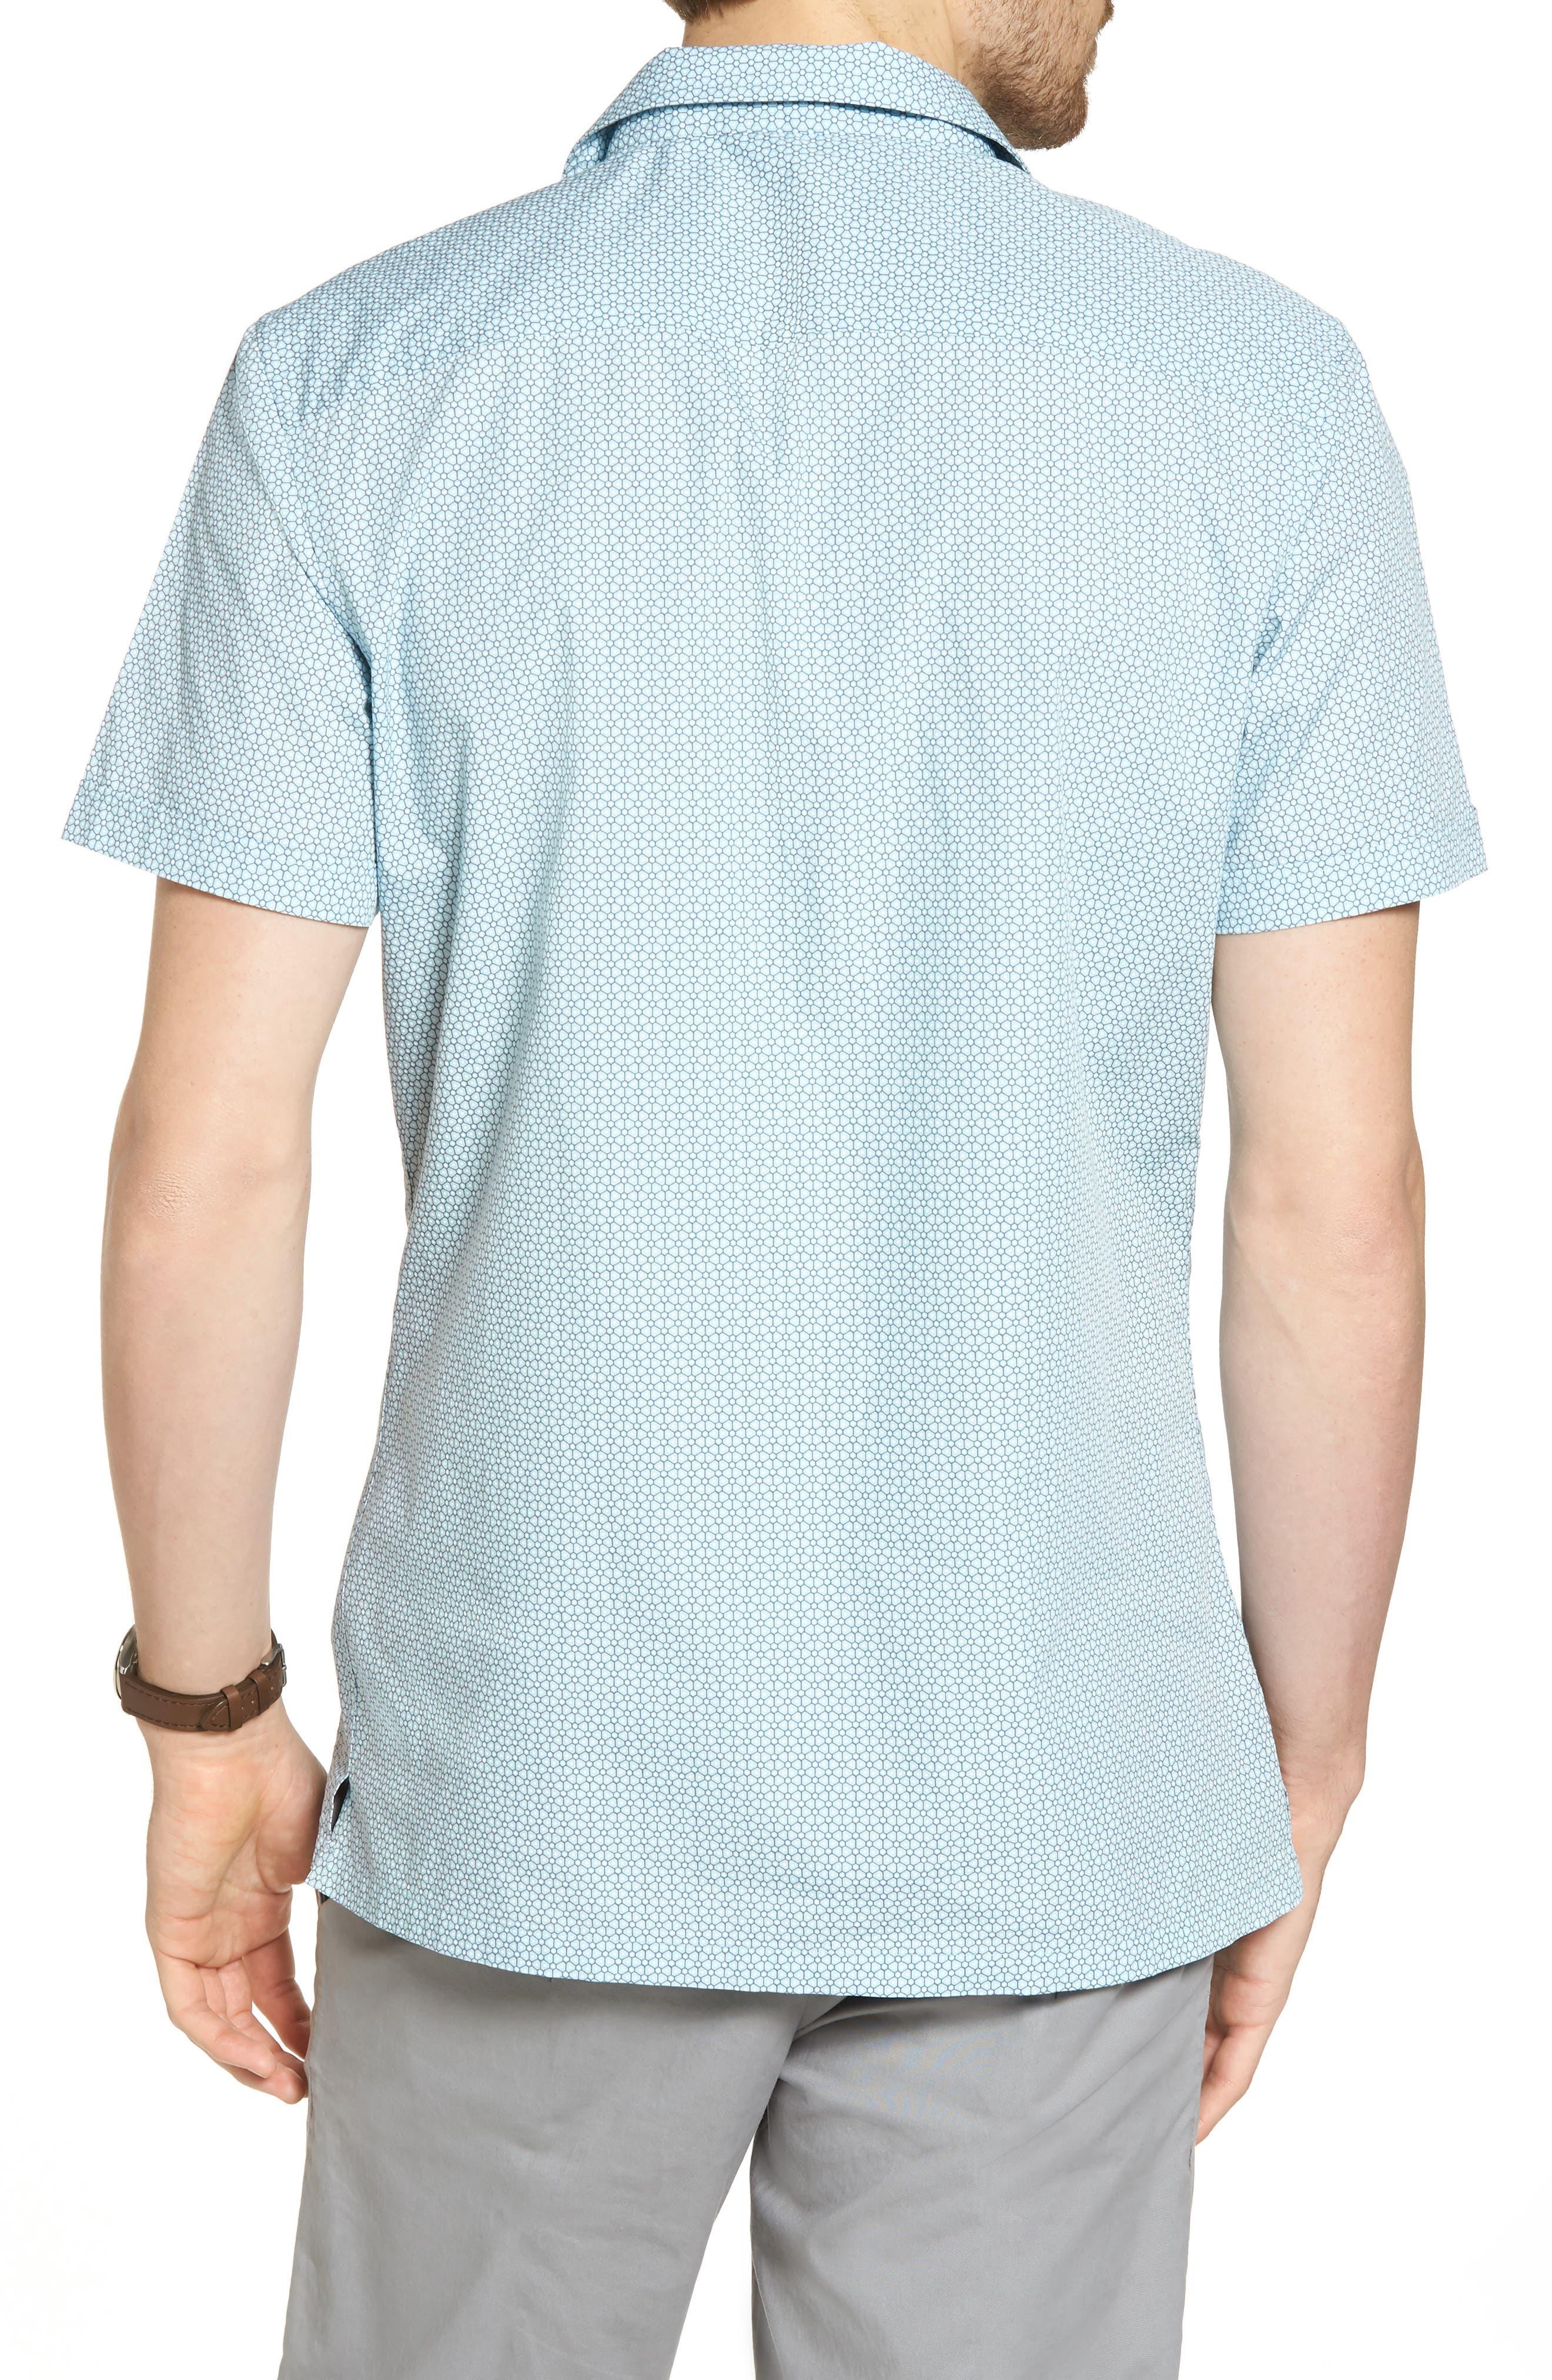 Trim Fit Stretch Geometric Camp Shirt,                             Alternate thumbnail 3, color,                             Blue Orydalis Honeycomb